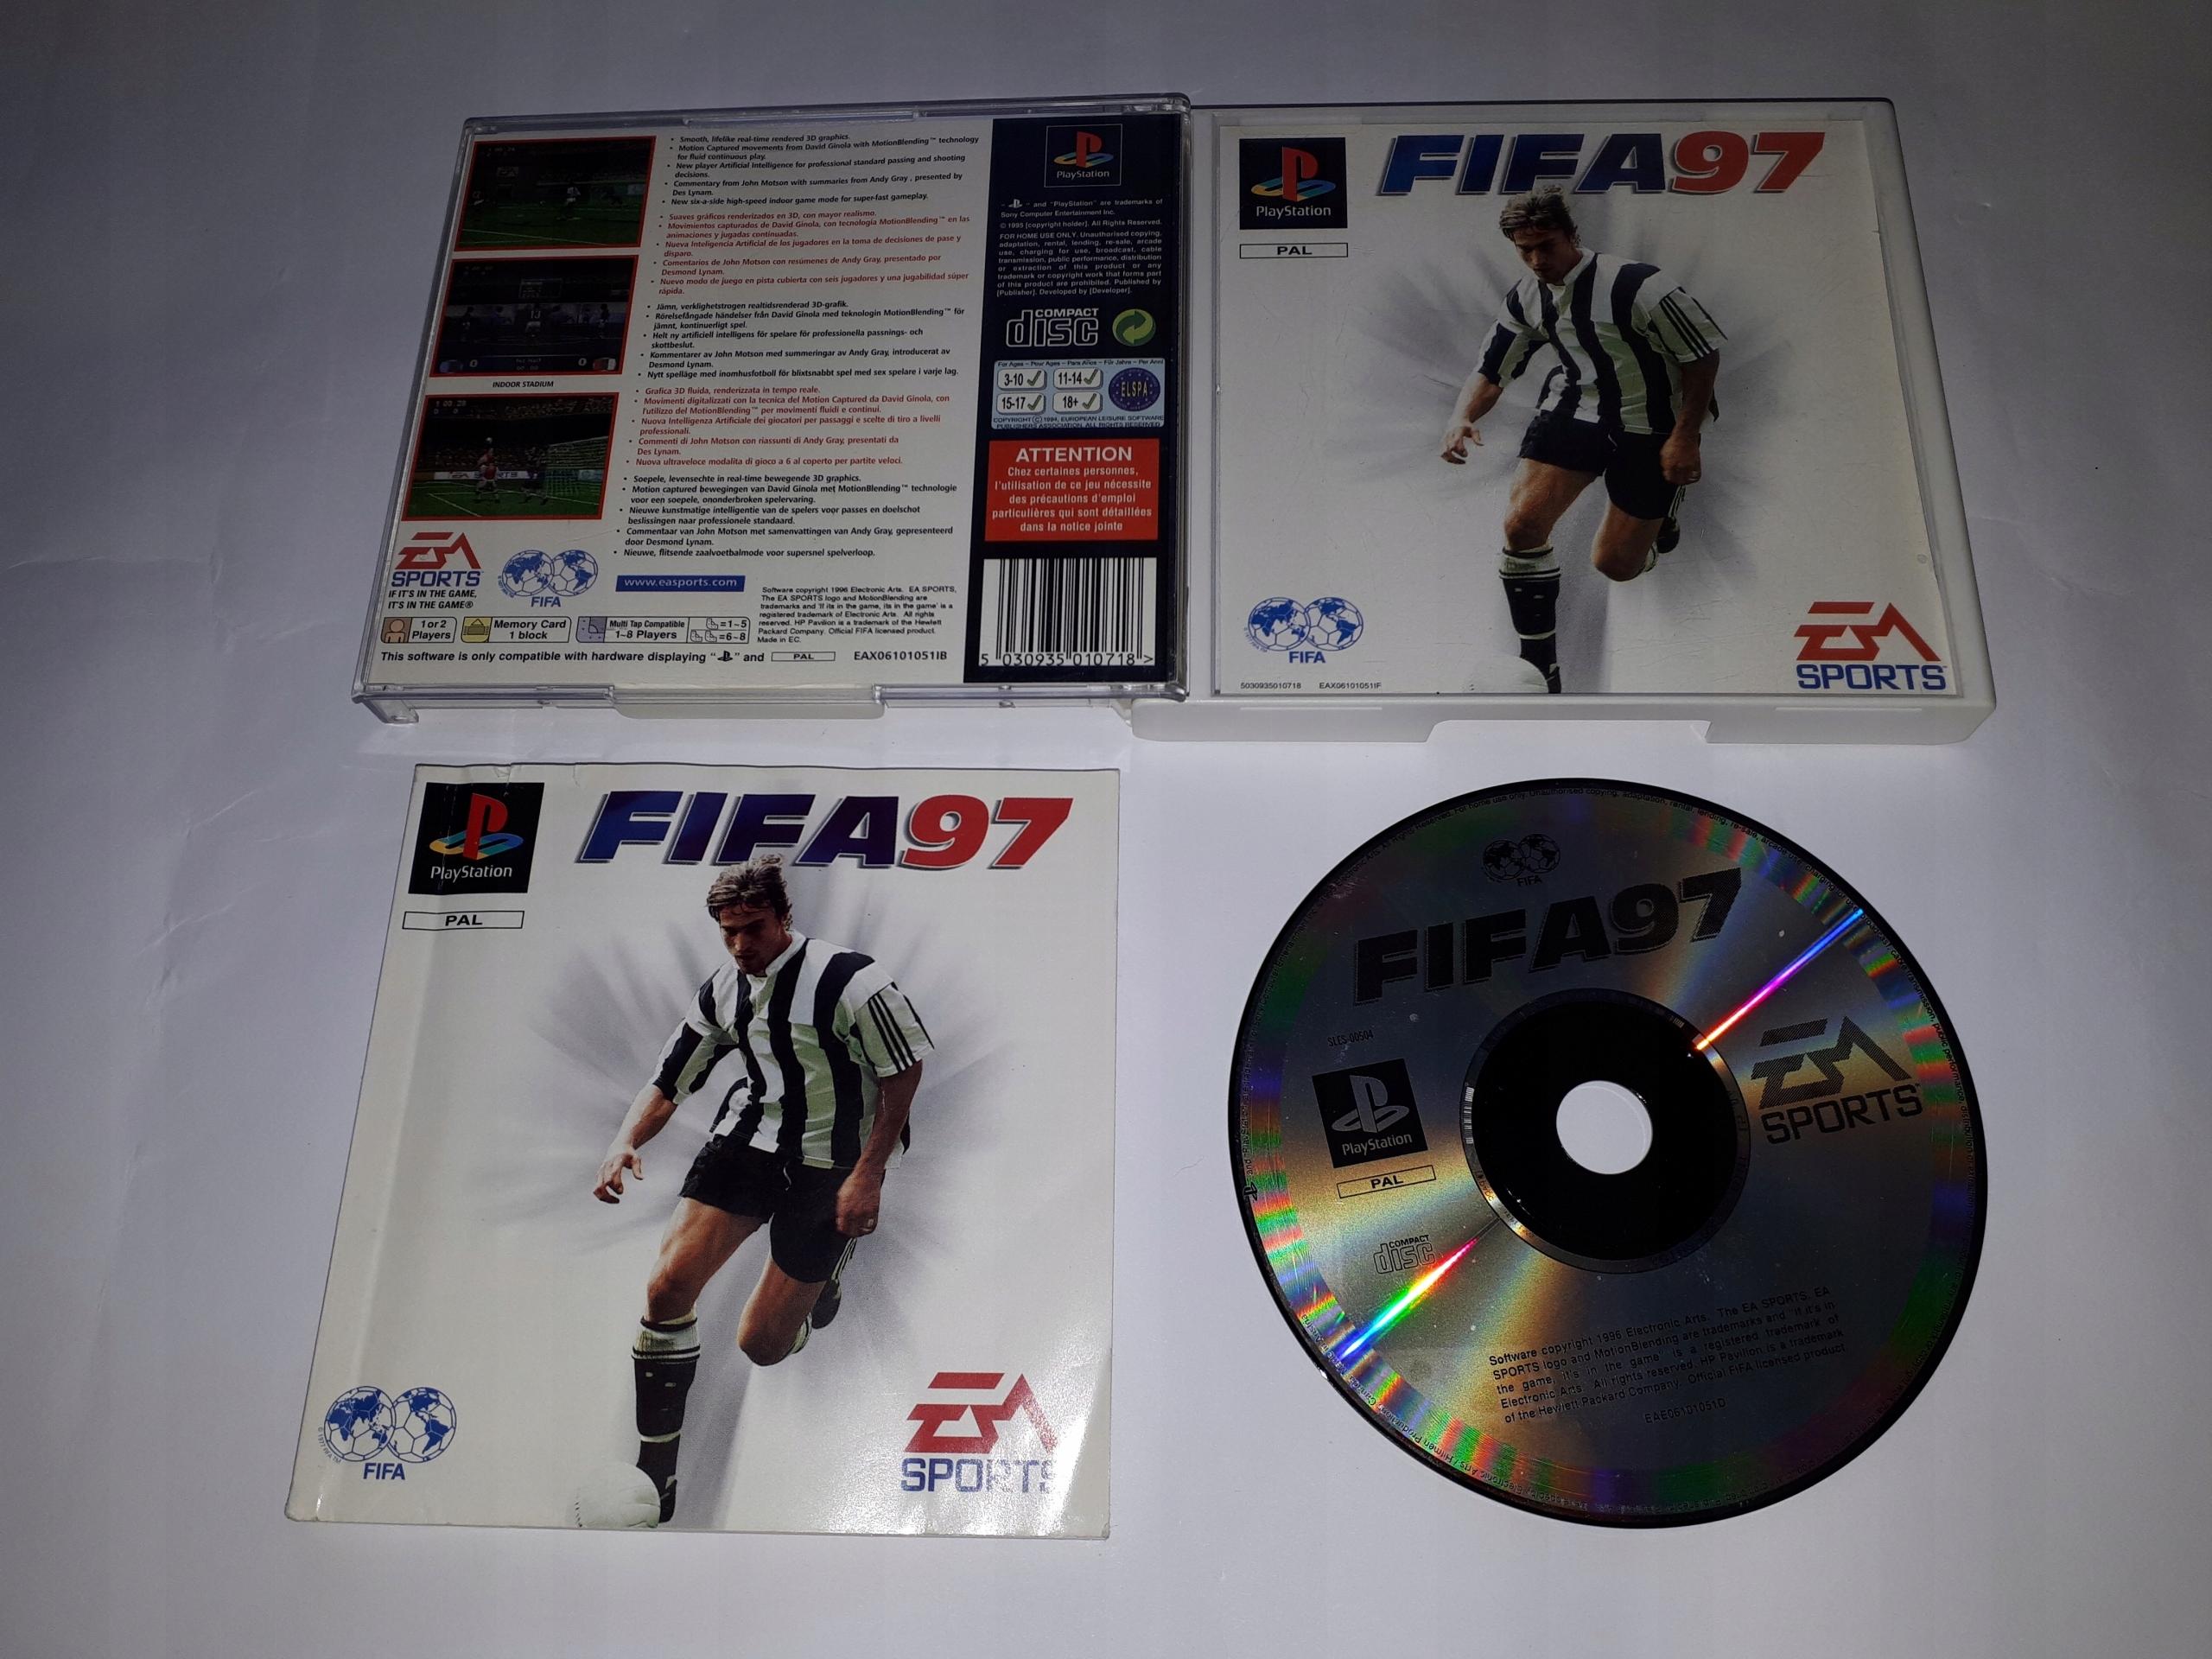 1e526594a FIFA 97 SKLEP GWARANCJA - 7489986448 - oficjalne archiwum allegro